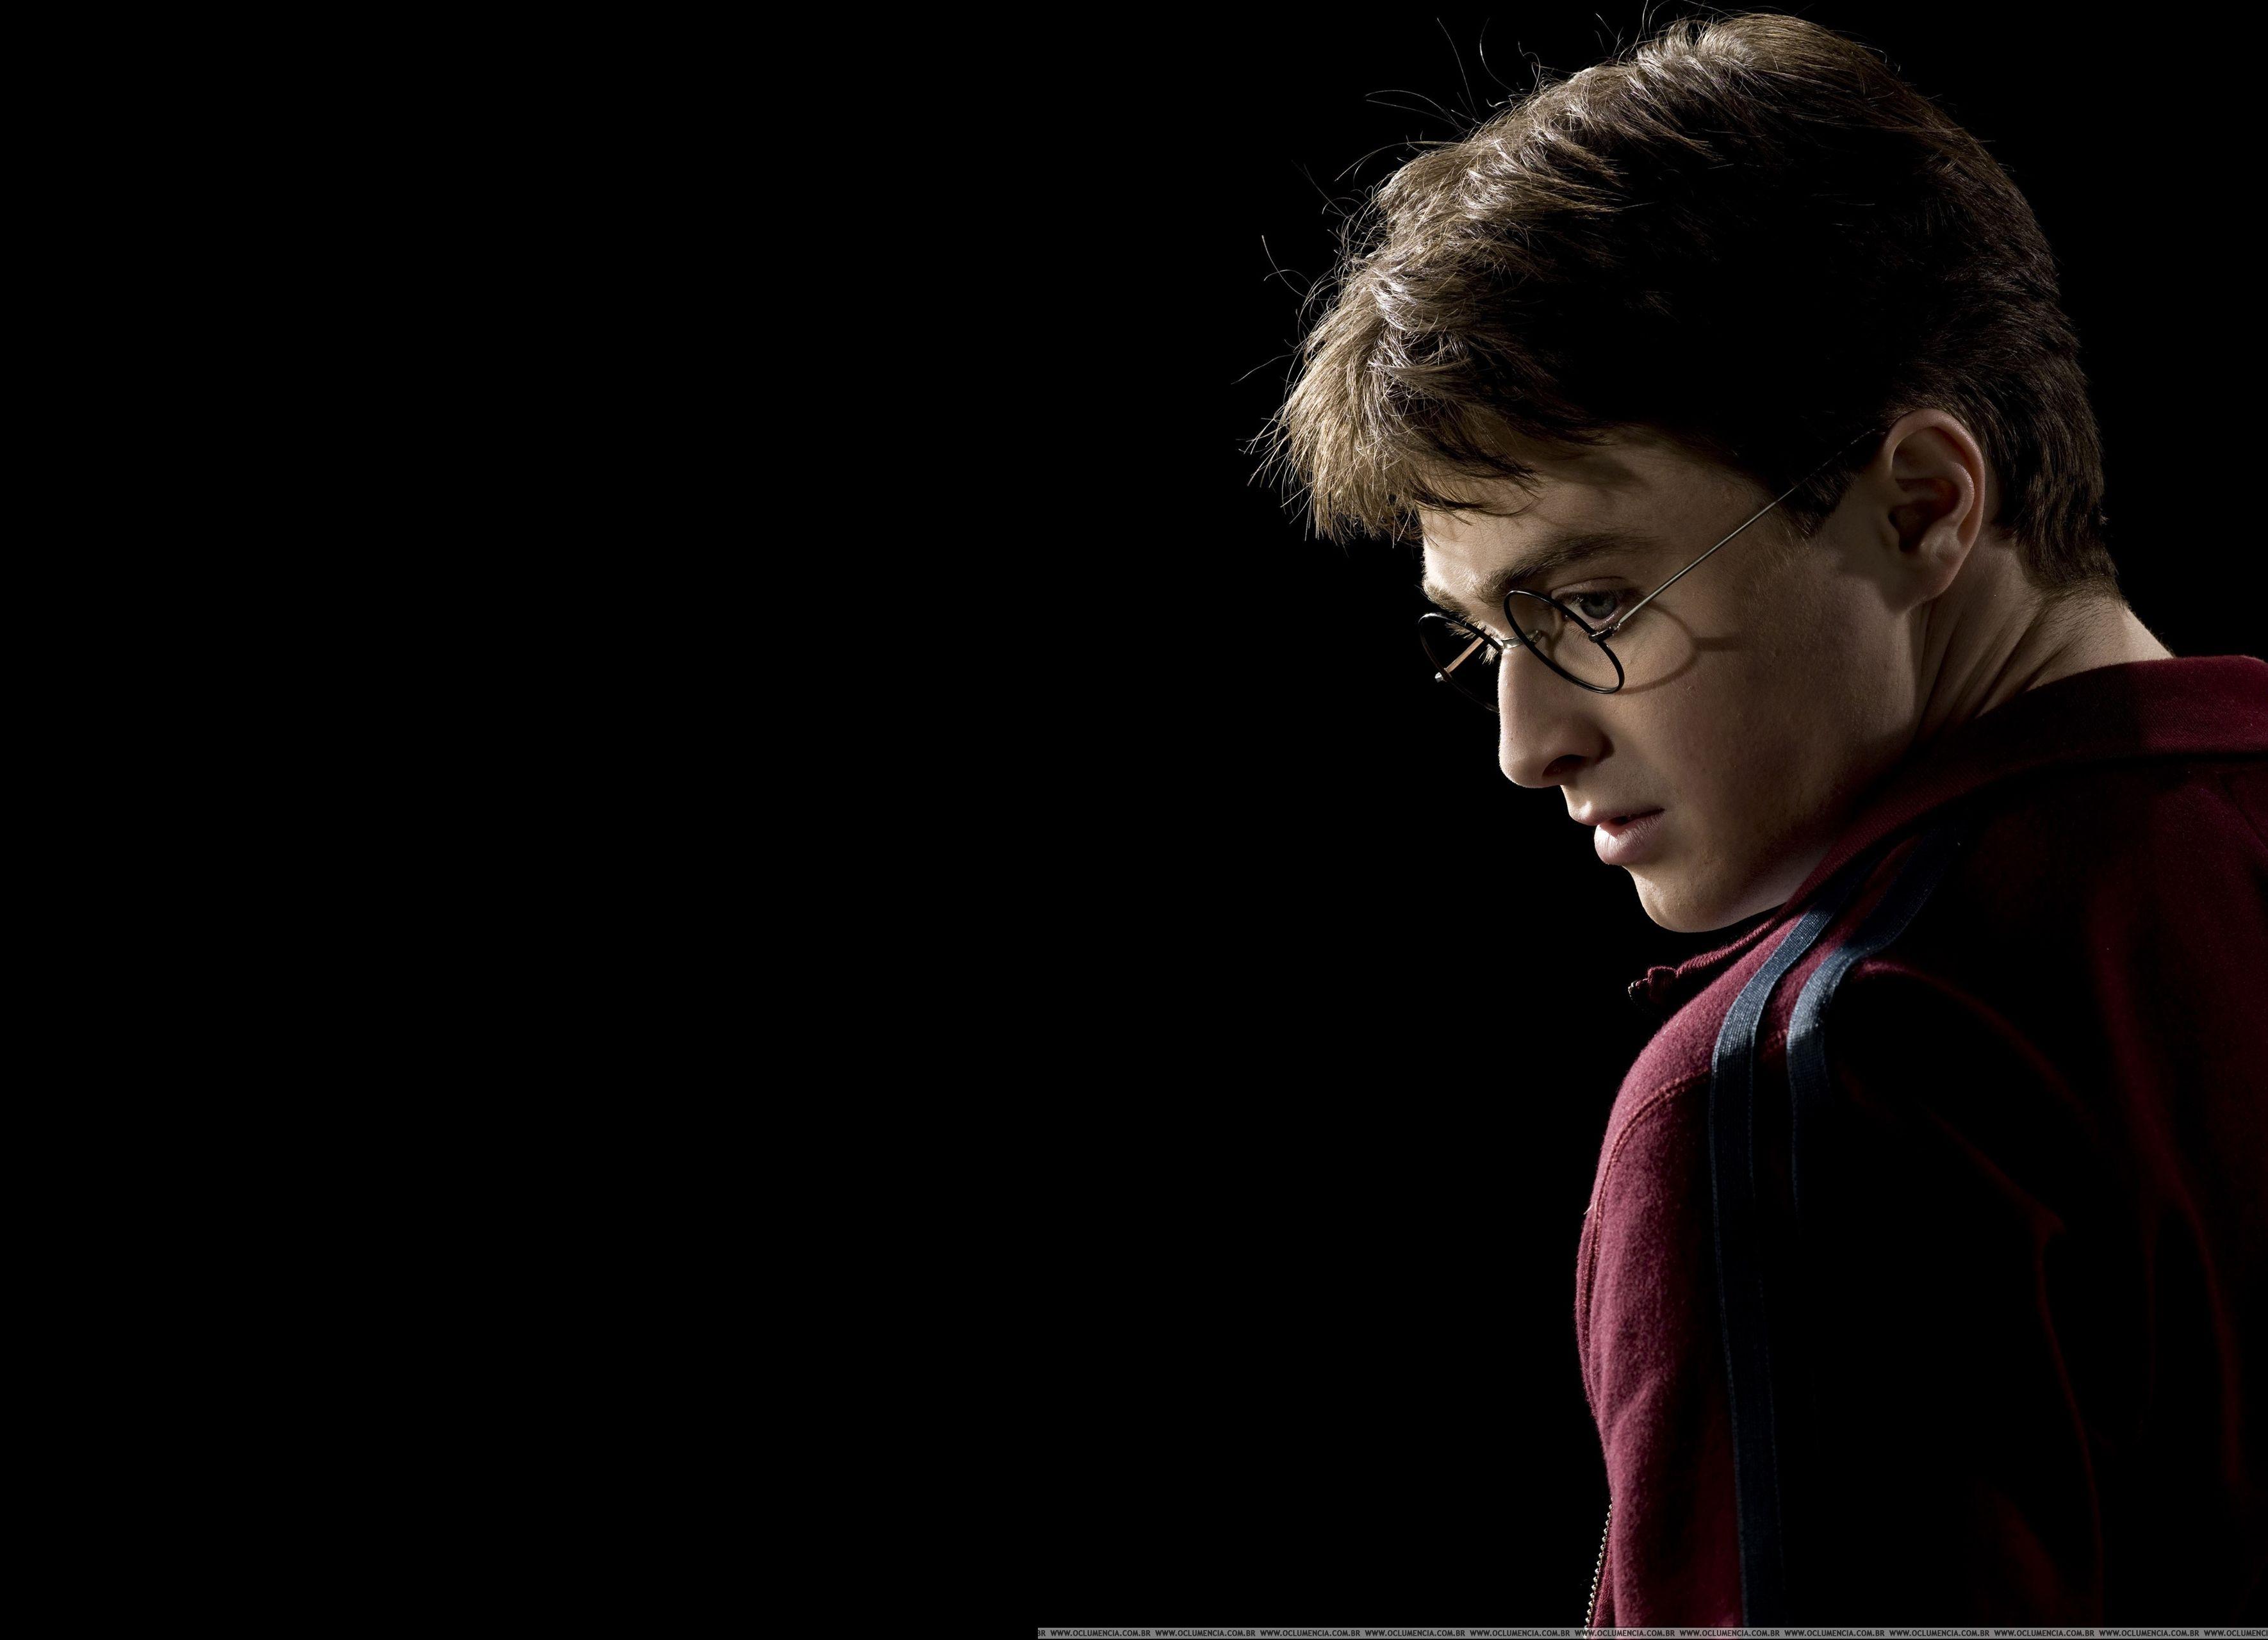 Most Inspiring Wallpaper Harry Potter Love - 95b908ff1b5853b6674053e3db18066a  Image_276894.jpg